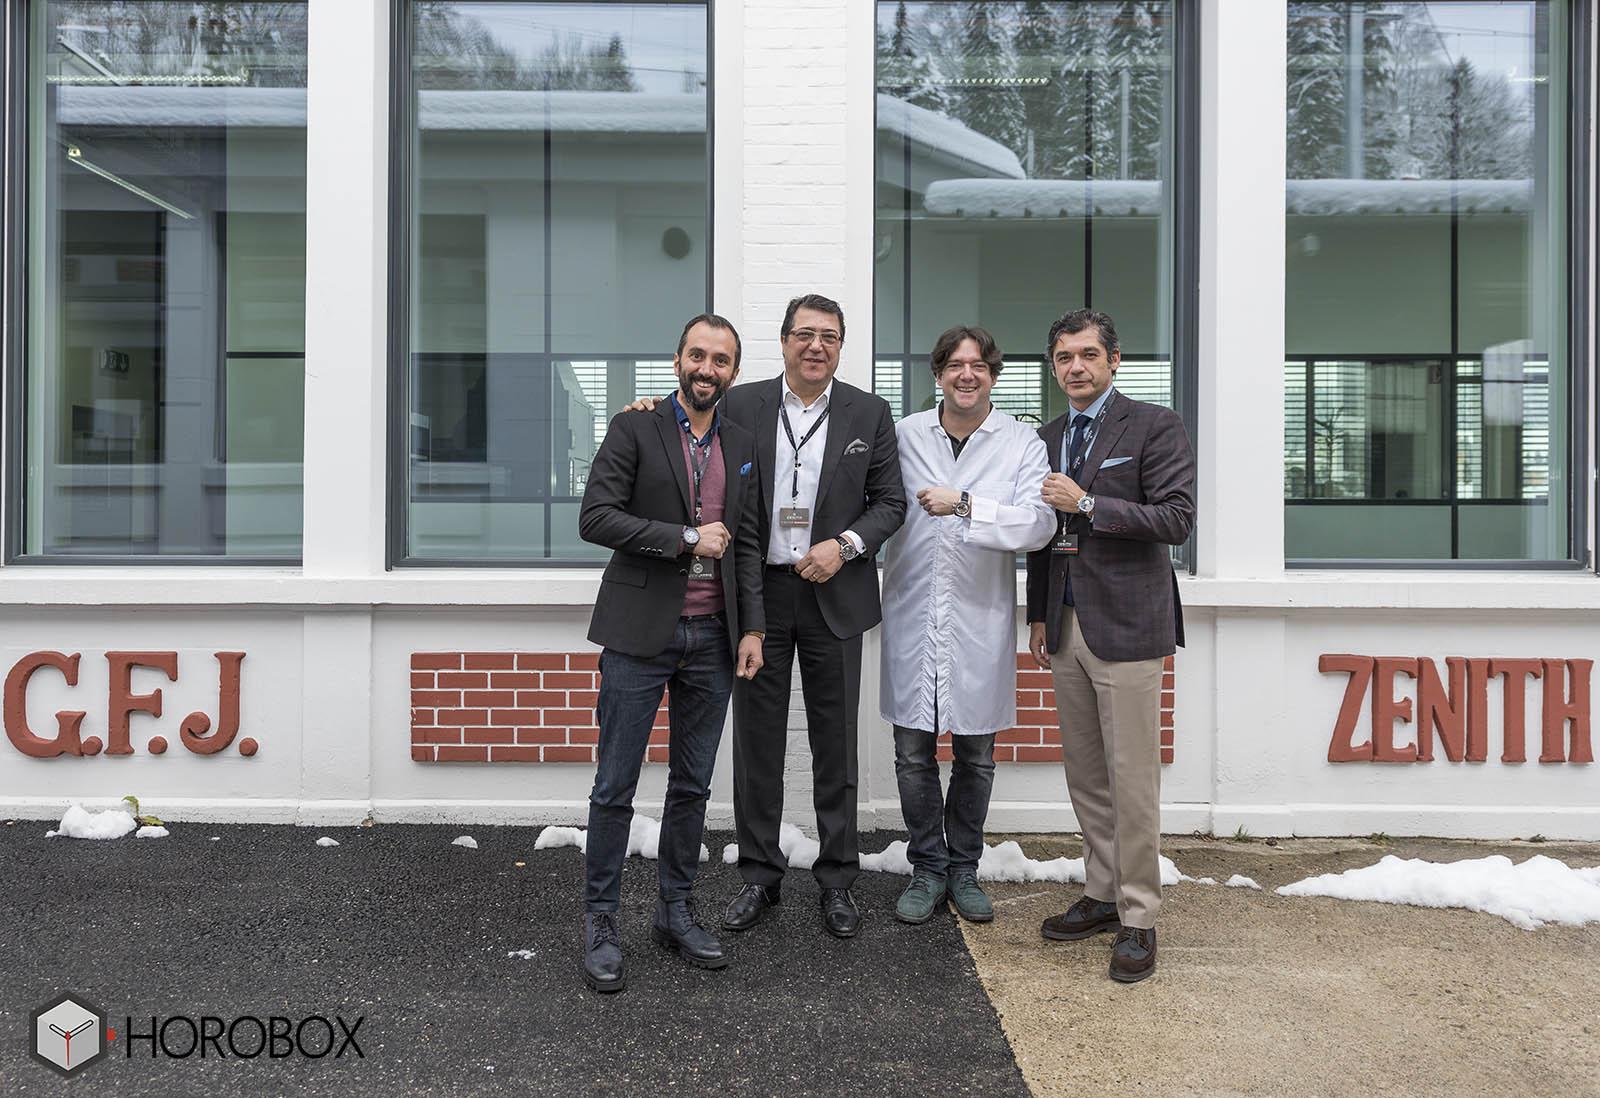 zenith-manufacturer-visiting-2017-34.jpg